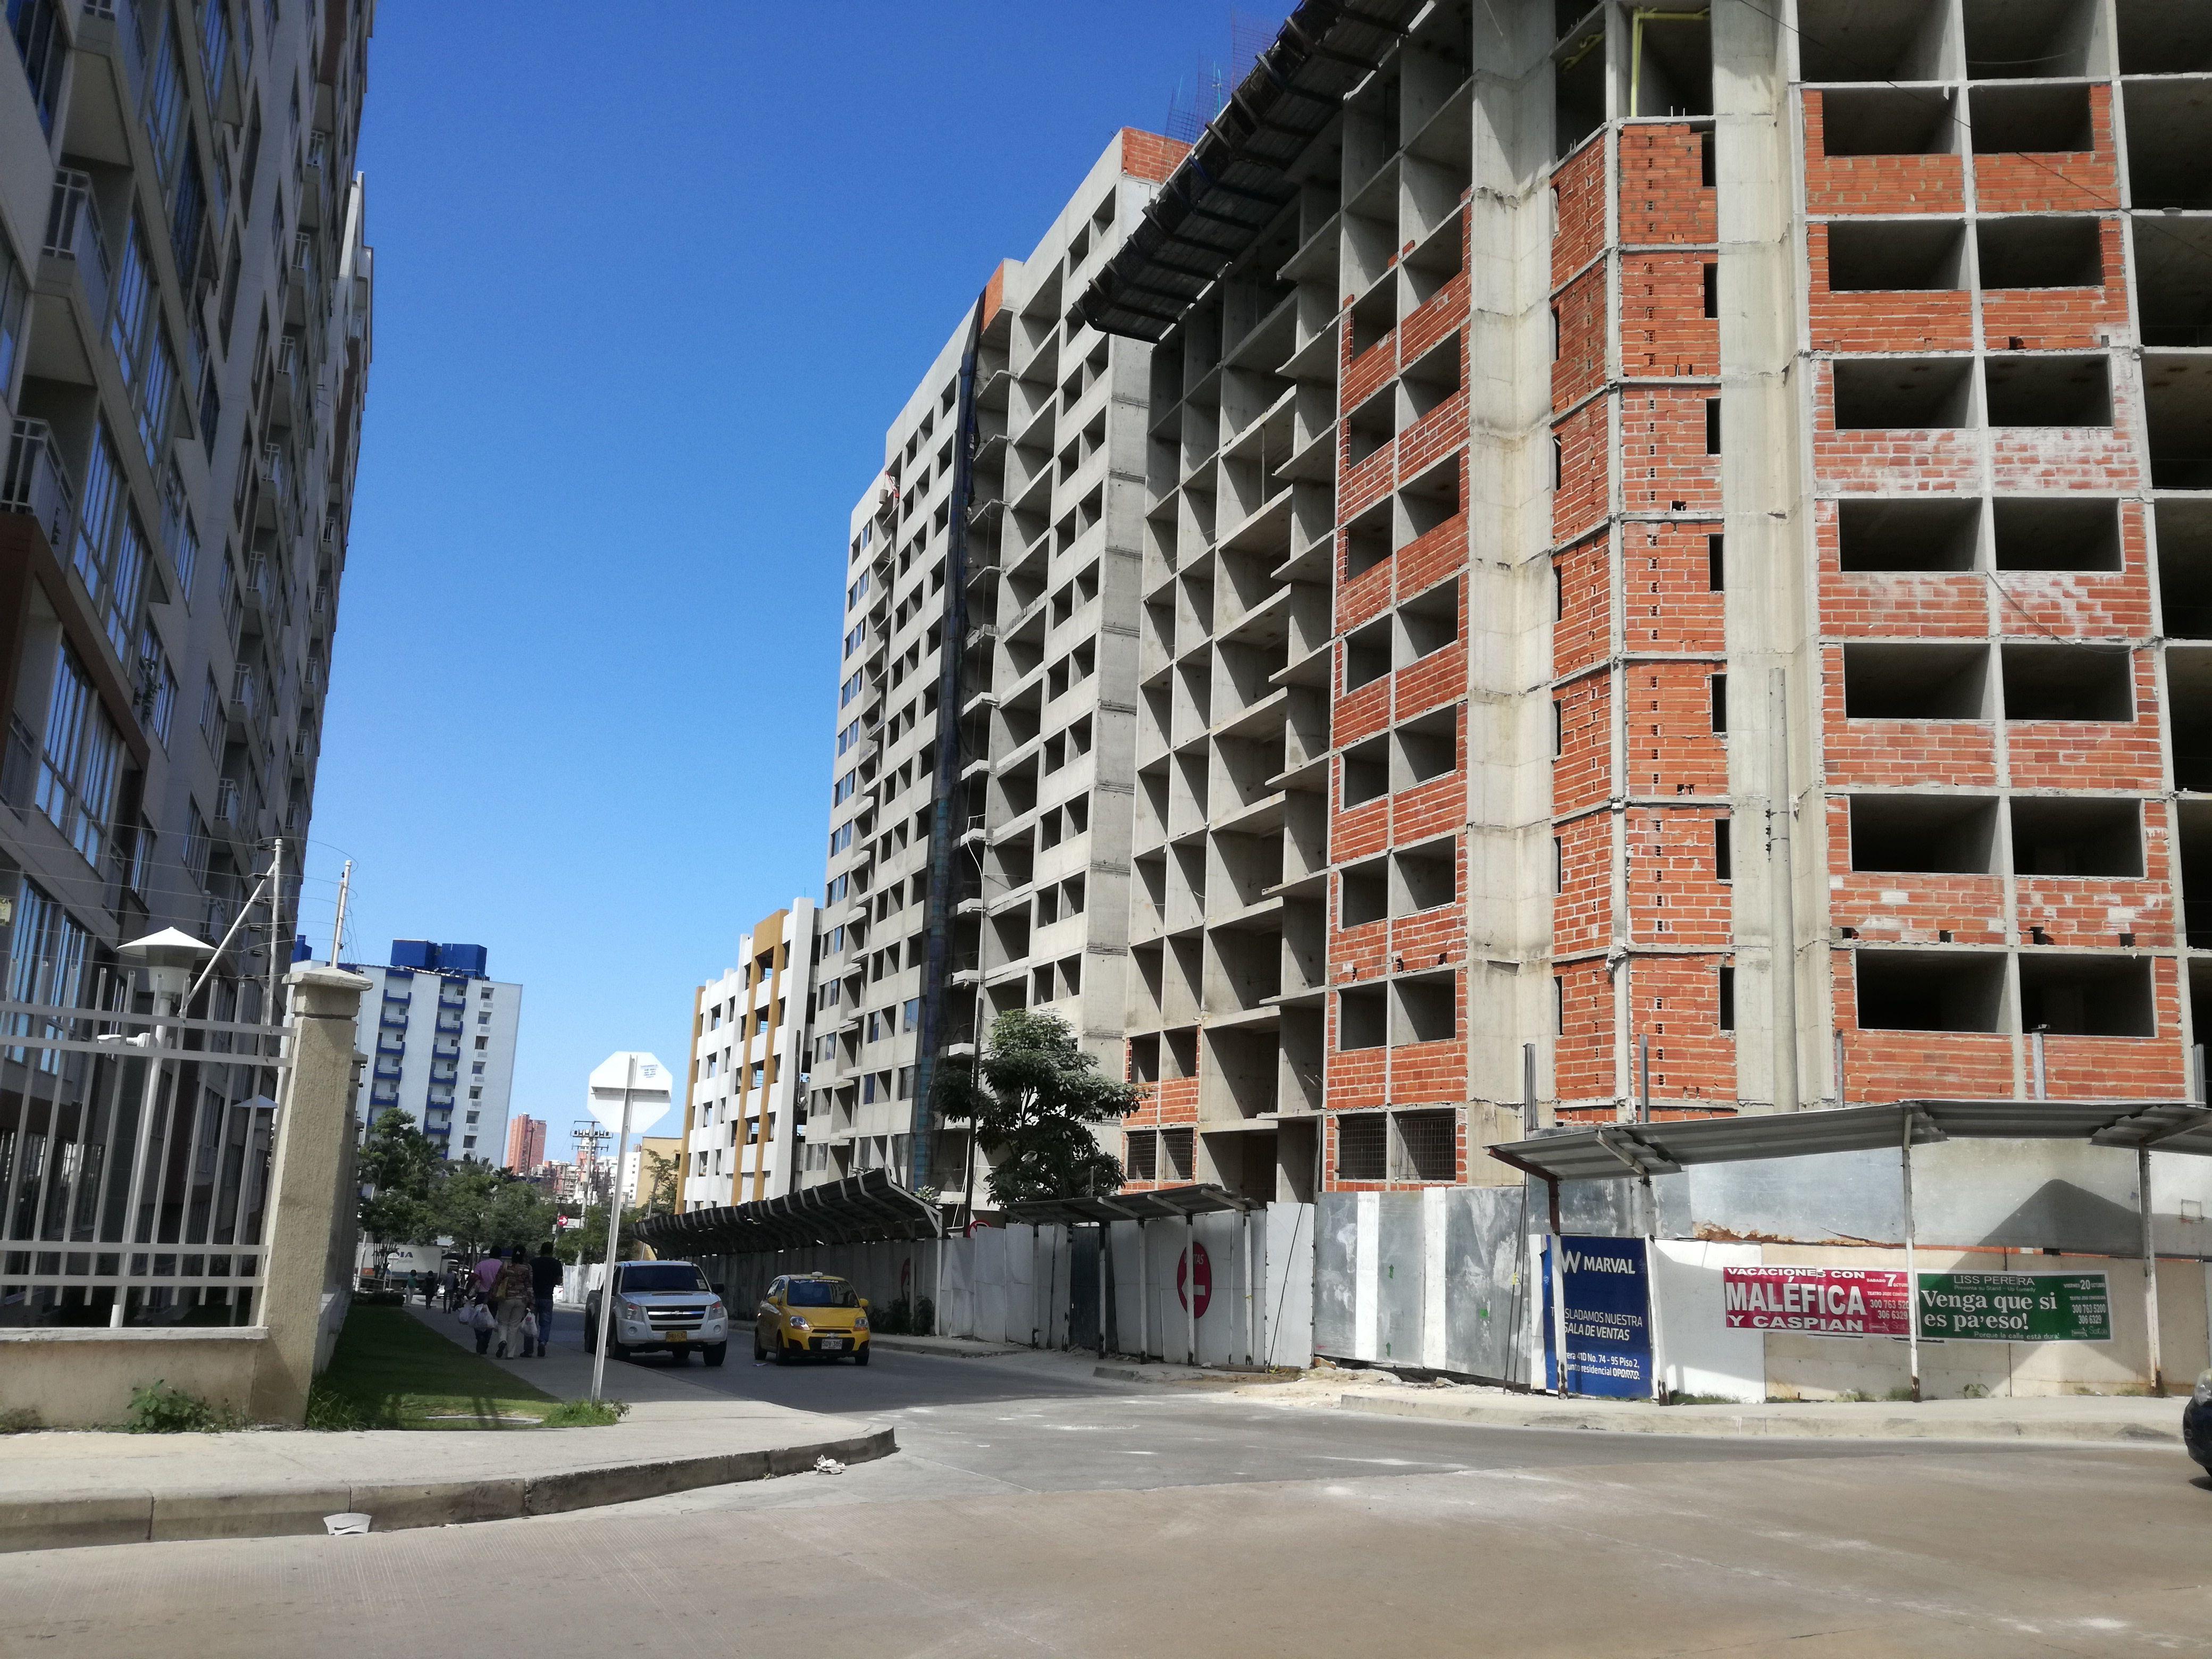 Foto: Barranquilla - IEU